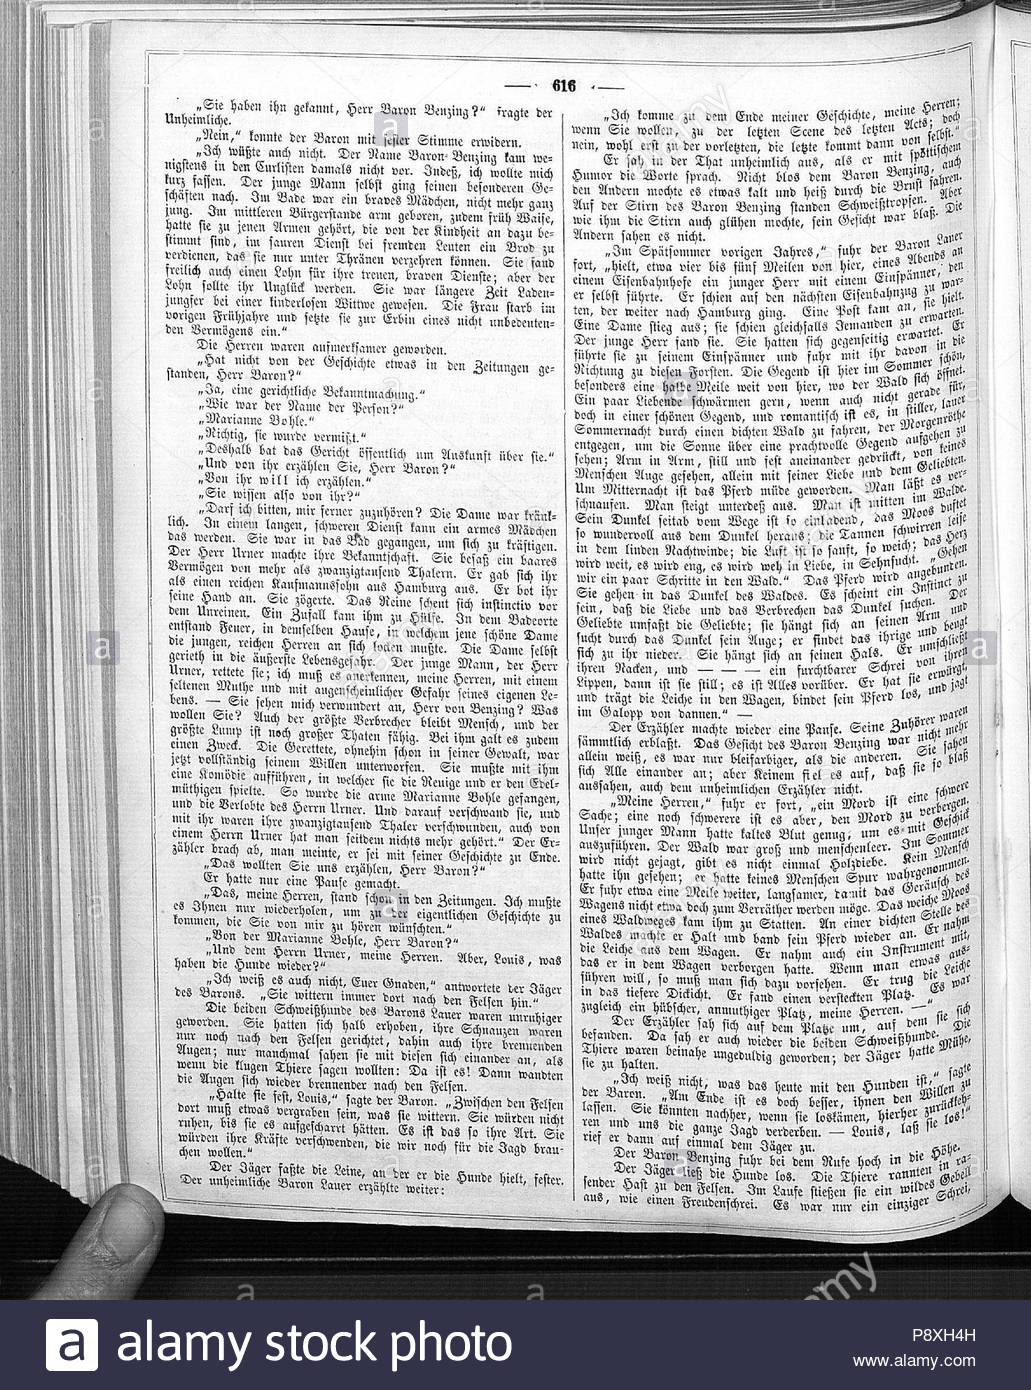 132 gartenlaube 1859 616 P8XH4H